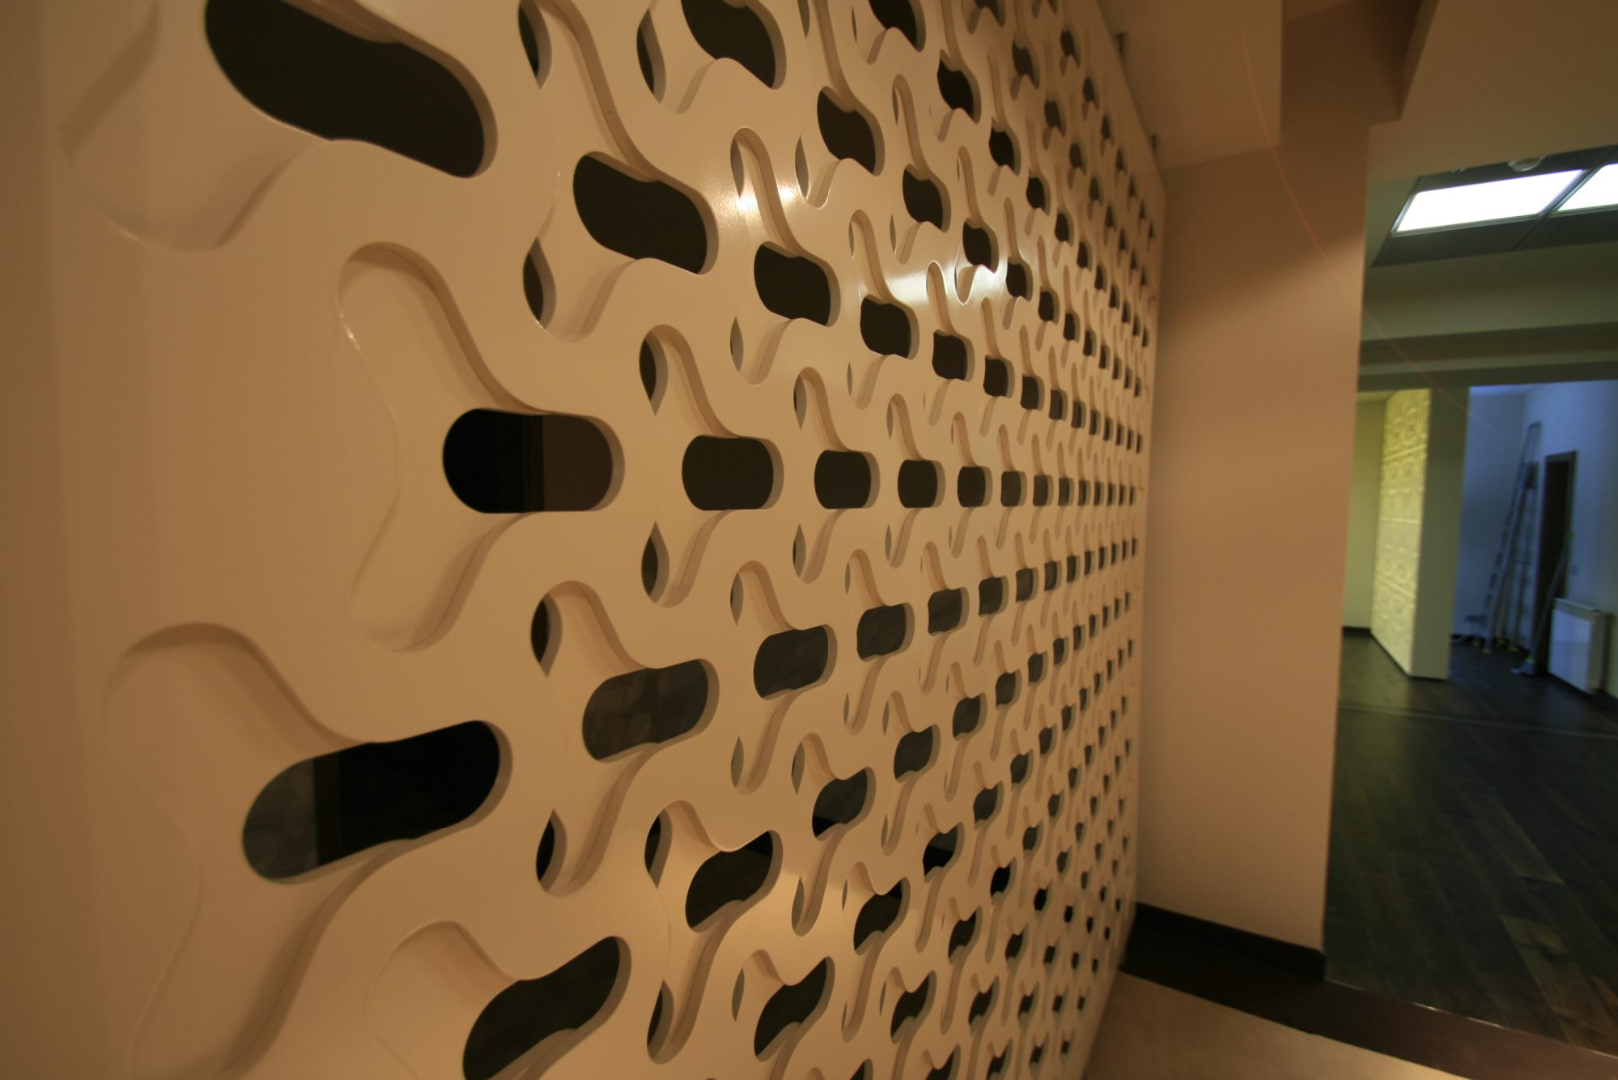 placari pereti corian iluminat led receptie corian termoformat furnir tavan furnir nuc tridimensional mobilier trafoare atipic depa003